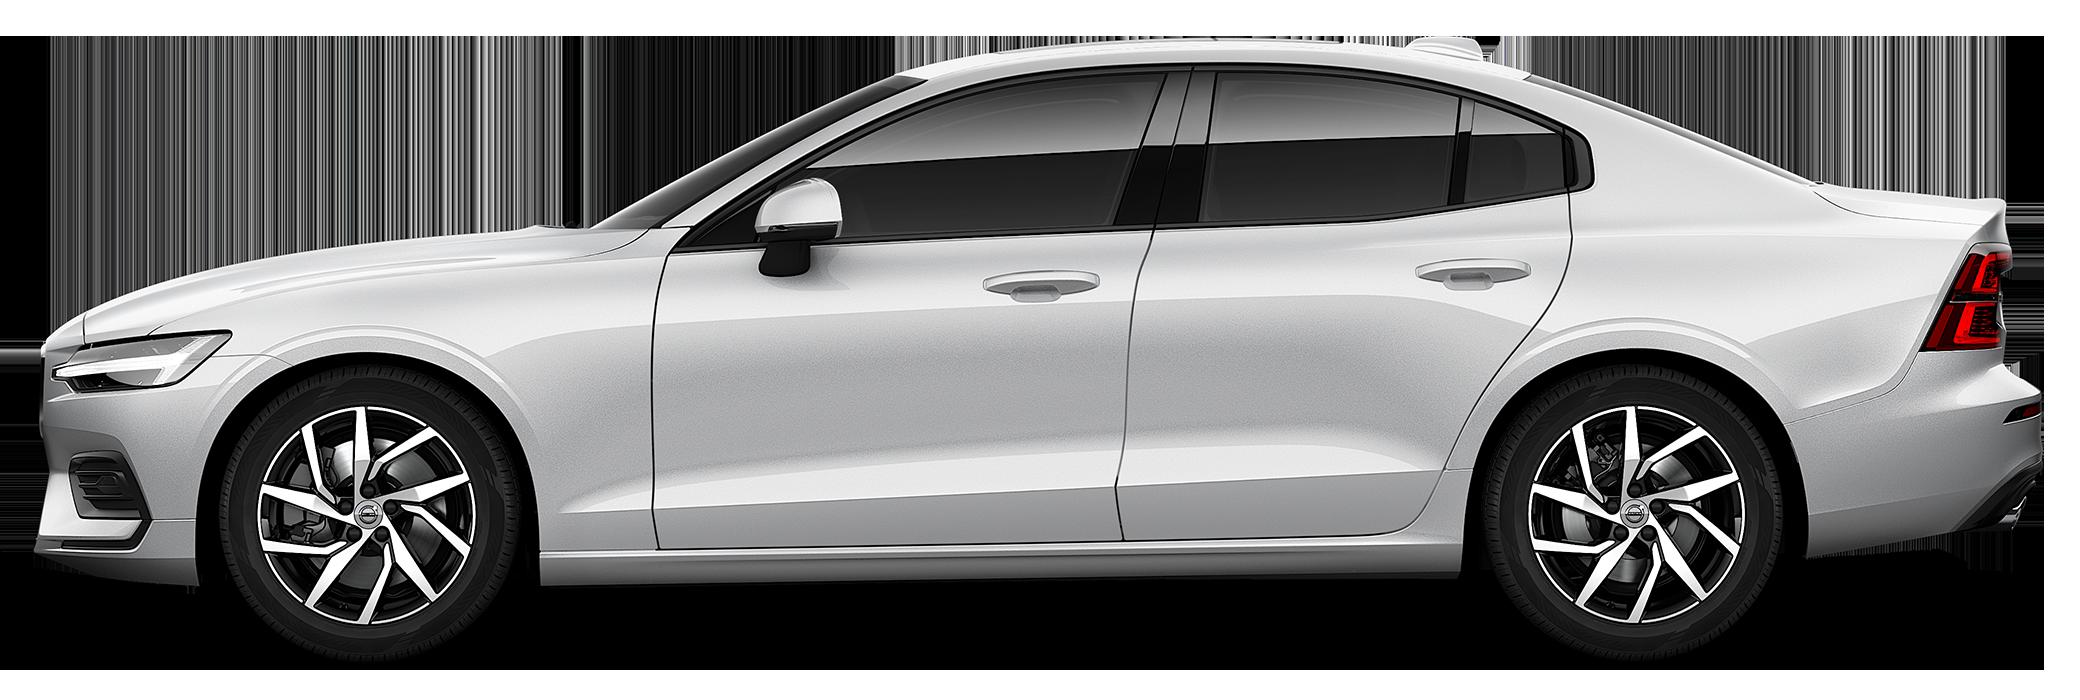 2019 Volvo S60 Sedan T5 Momentum